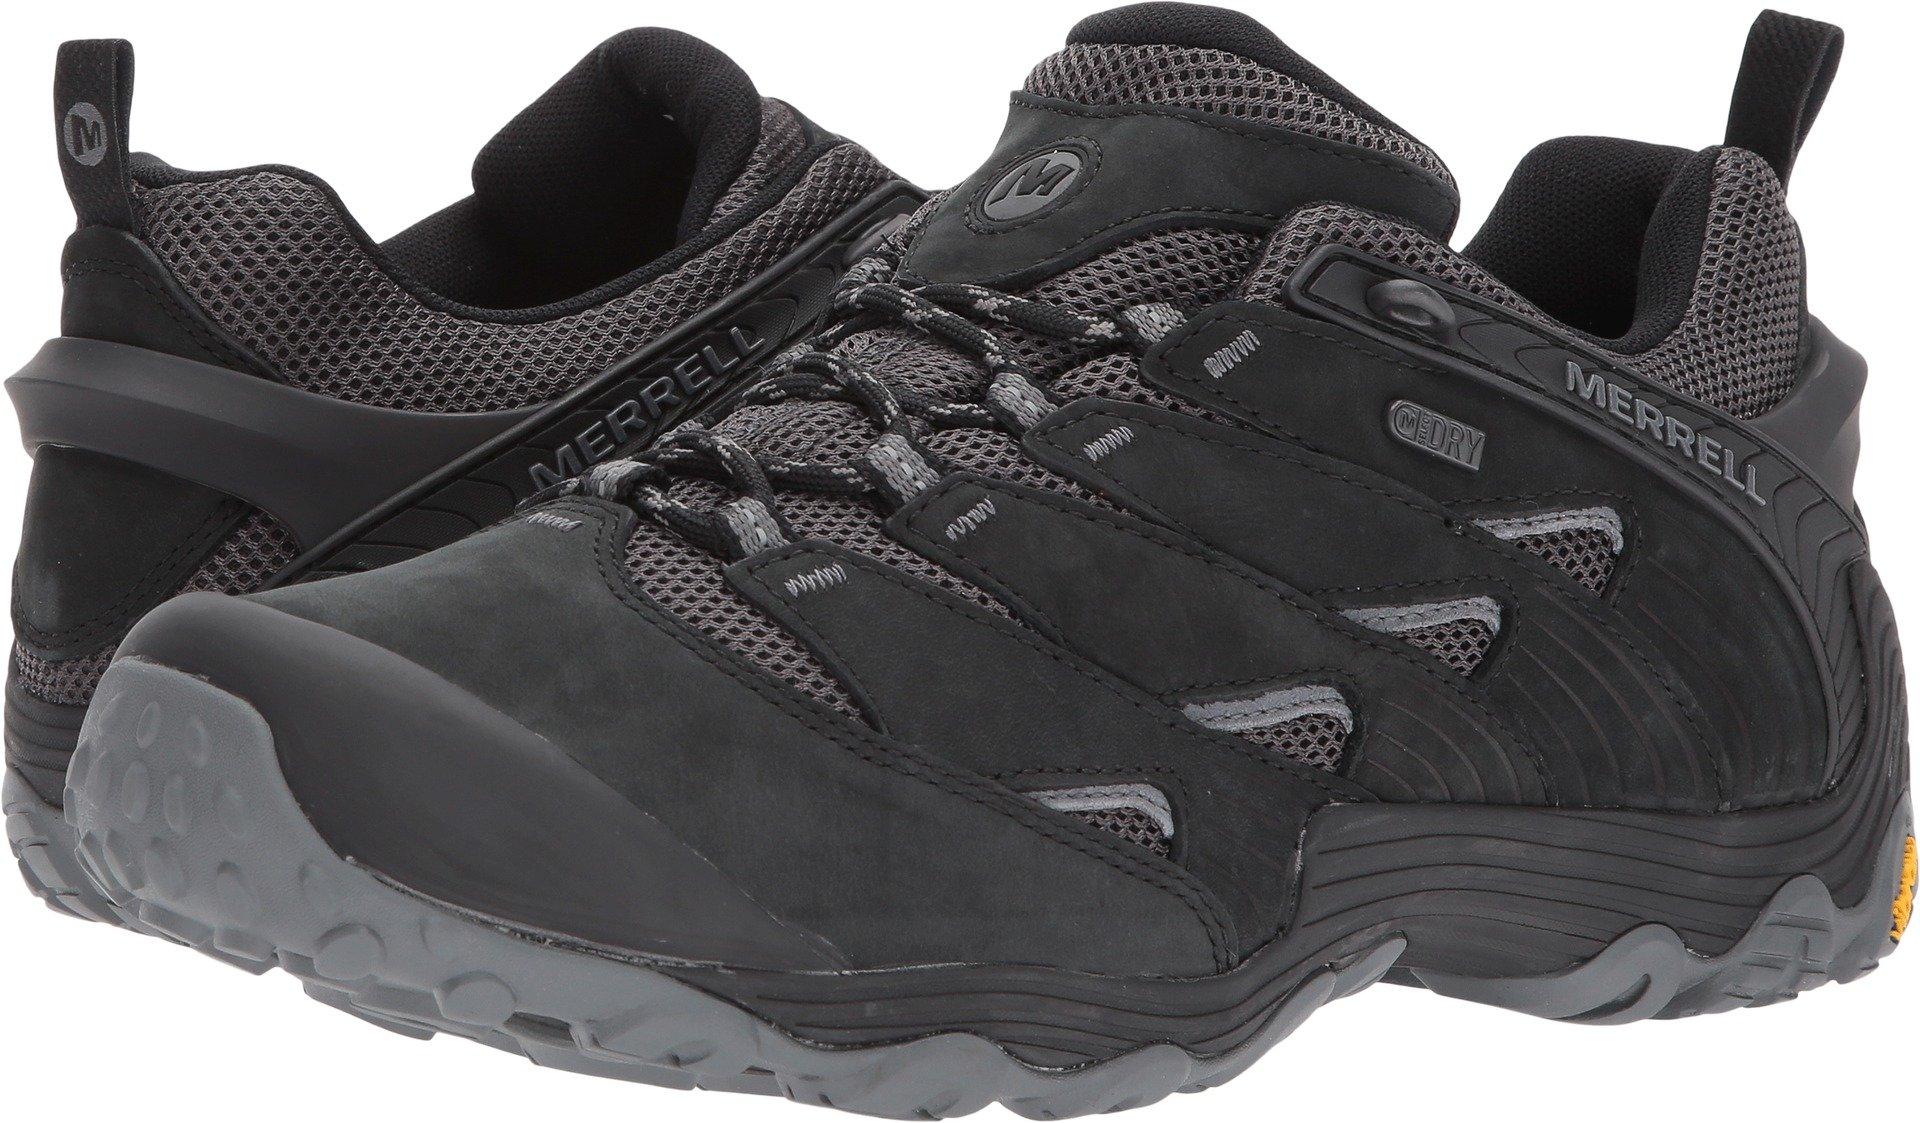 Merrell Chameleon 7 Waterproof Boot - Men's (10 D(M) US, Black)